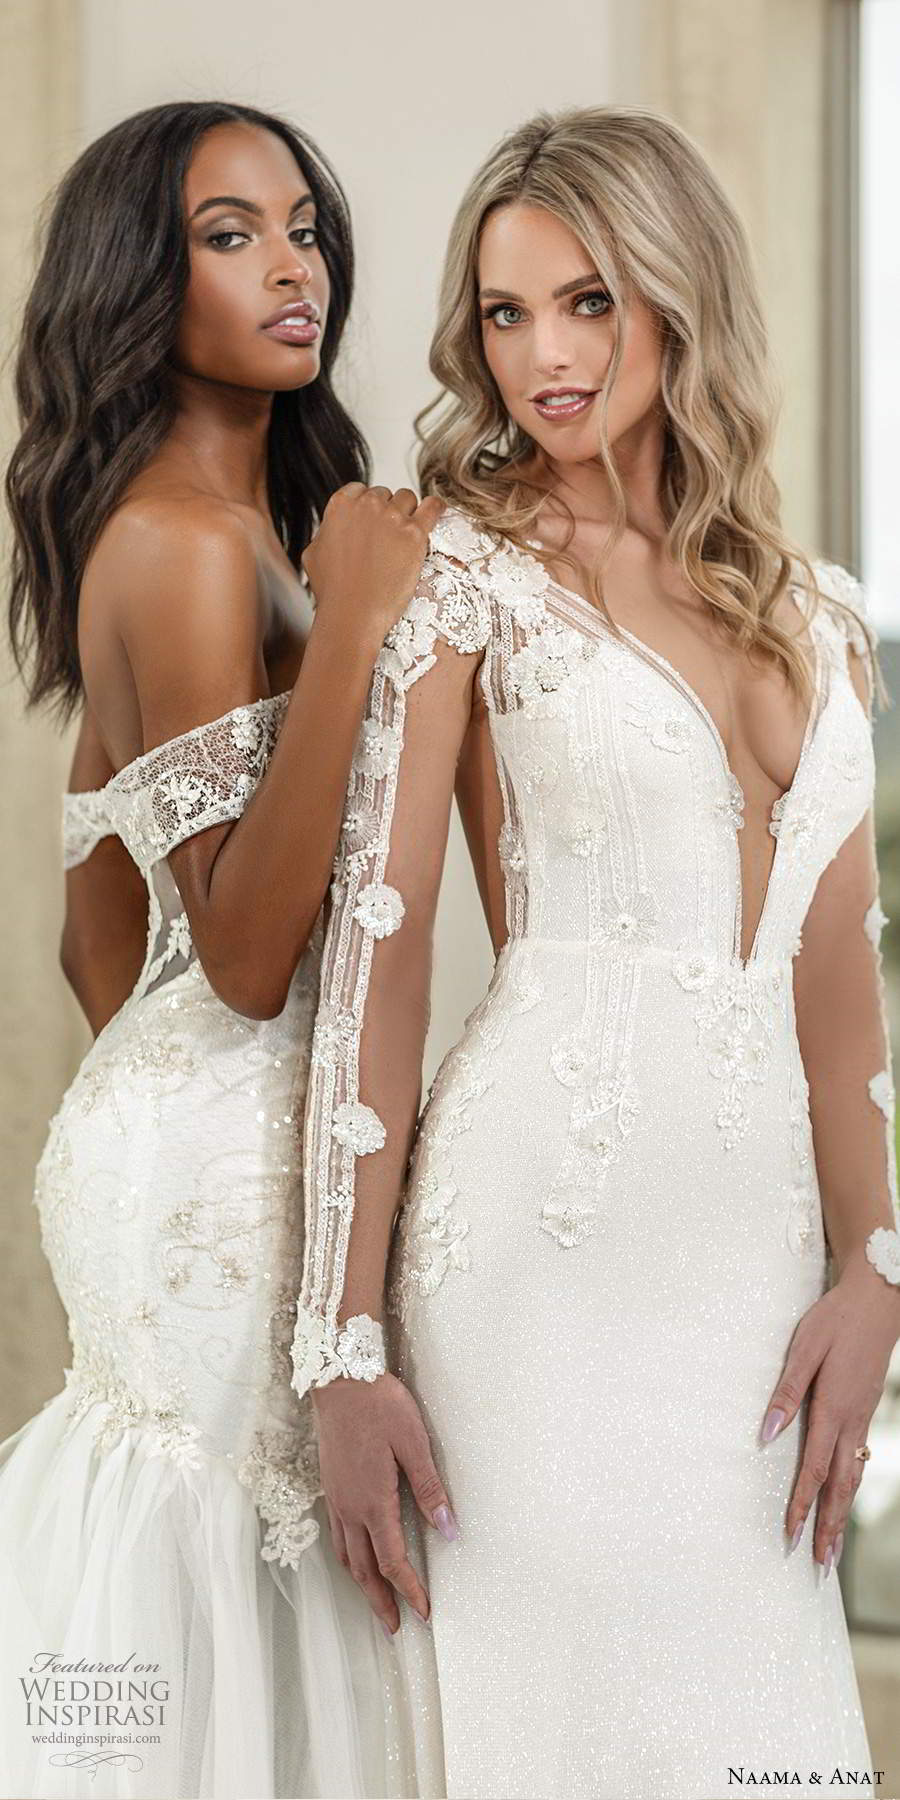 naama anat spring 2020 knottinghill bridal illusion long sleeves plunging v neckline heavily embellished bodice fit flare a line wedding dress sheer back chapel train (7) zfv